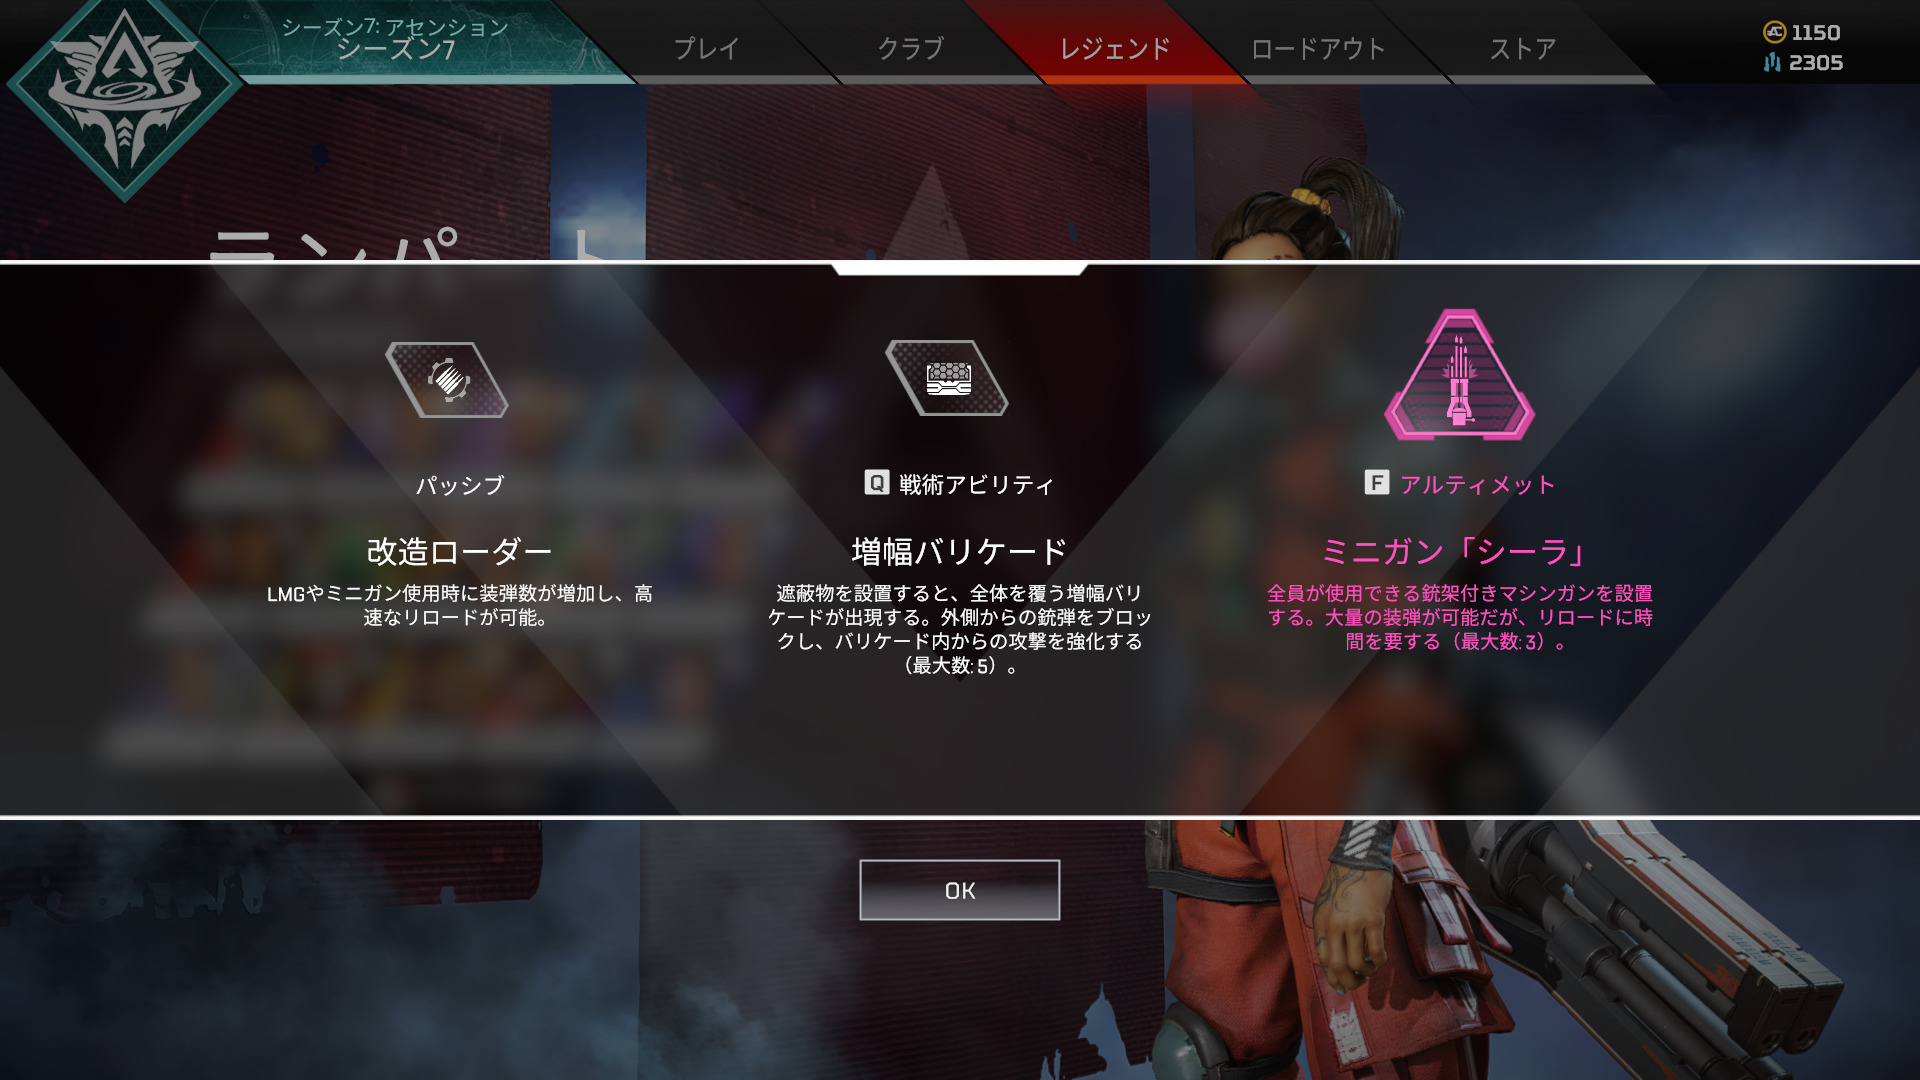 【Apex Legends】ランパート 日本語セリフ一覧【基本ボイス】【エーペックスレジェンズ】